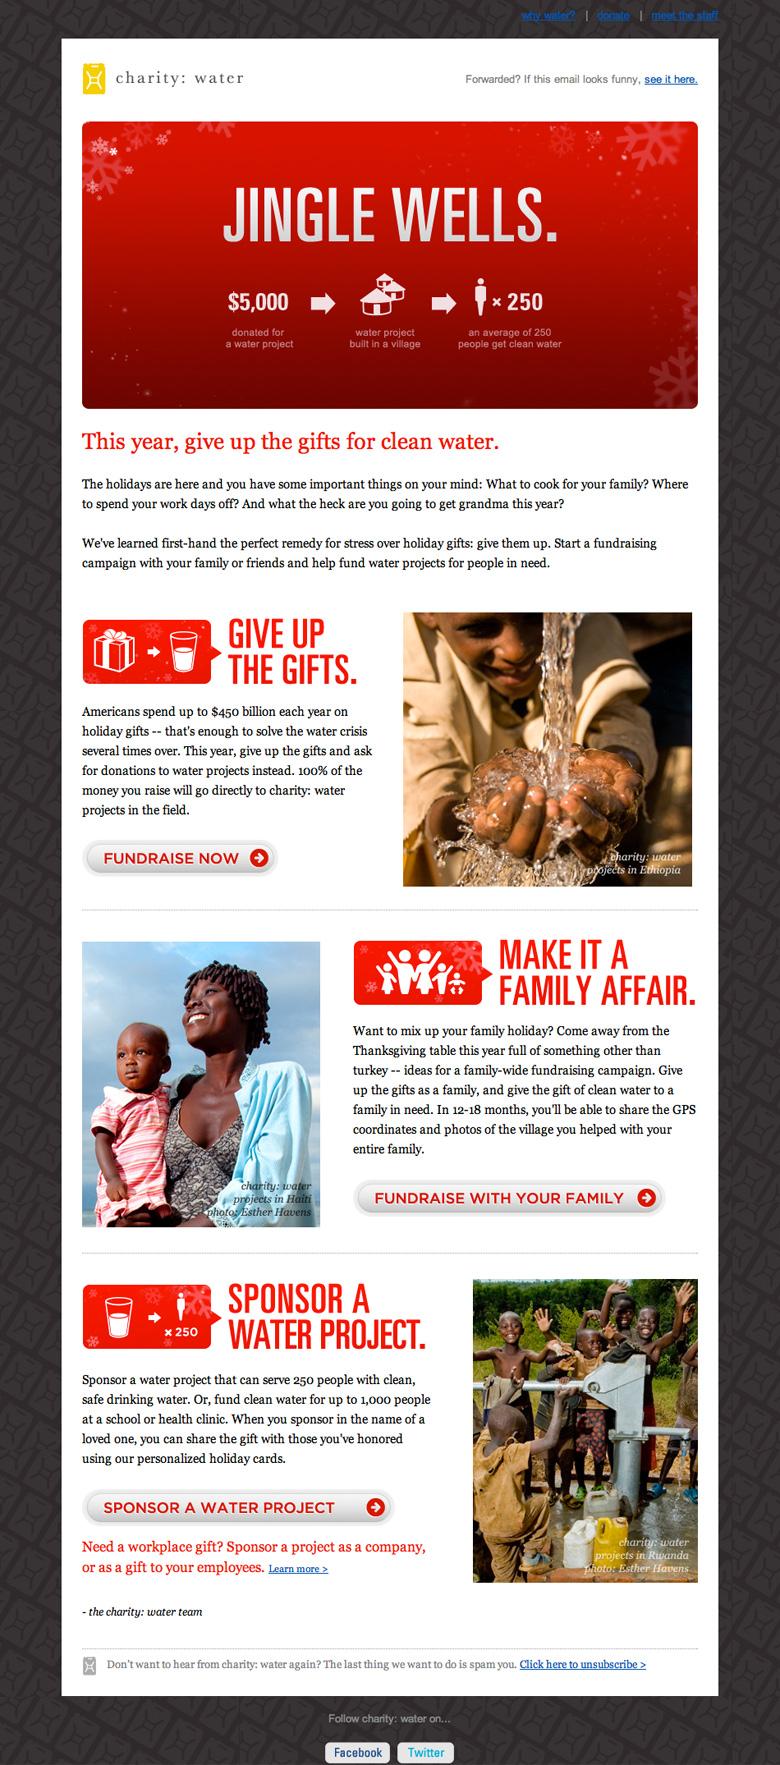 Charity Water Jingle Wells email